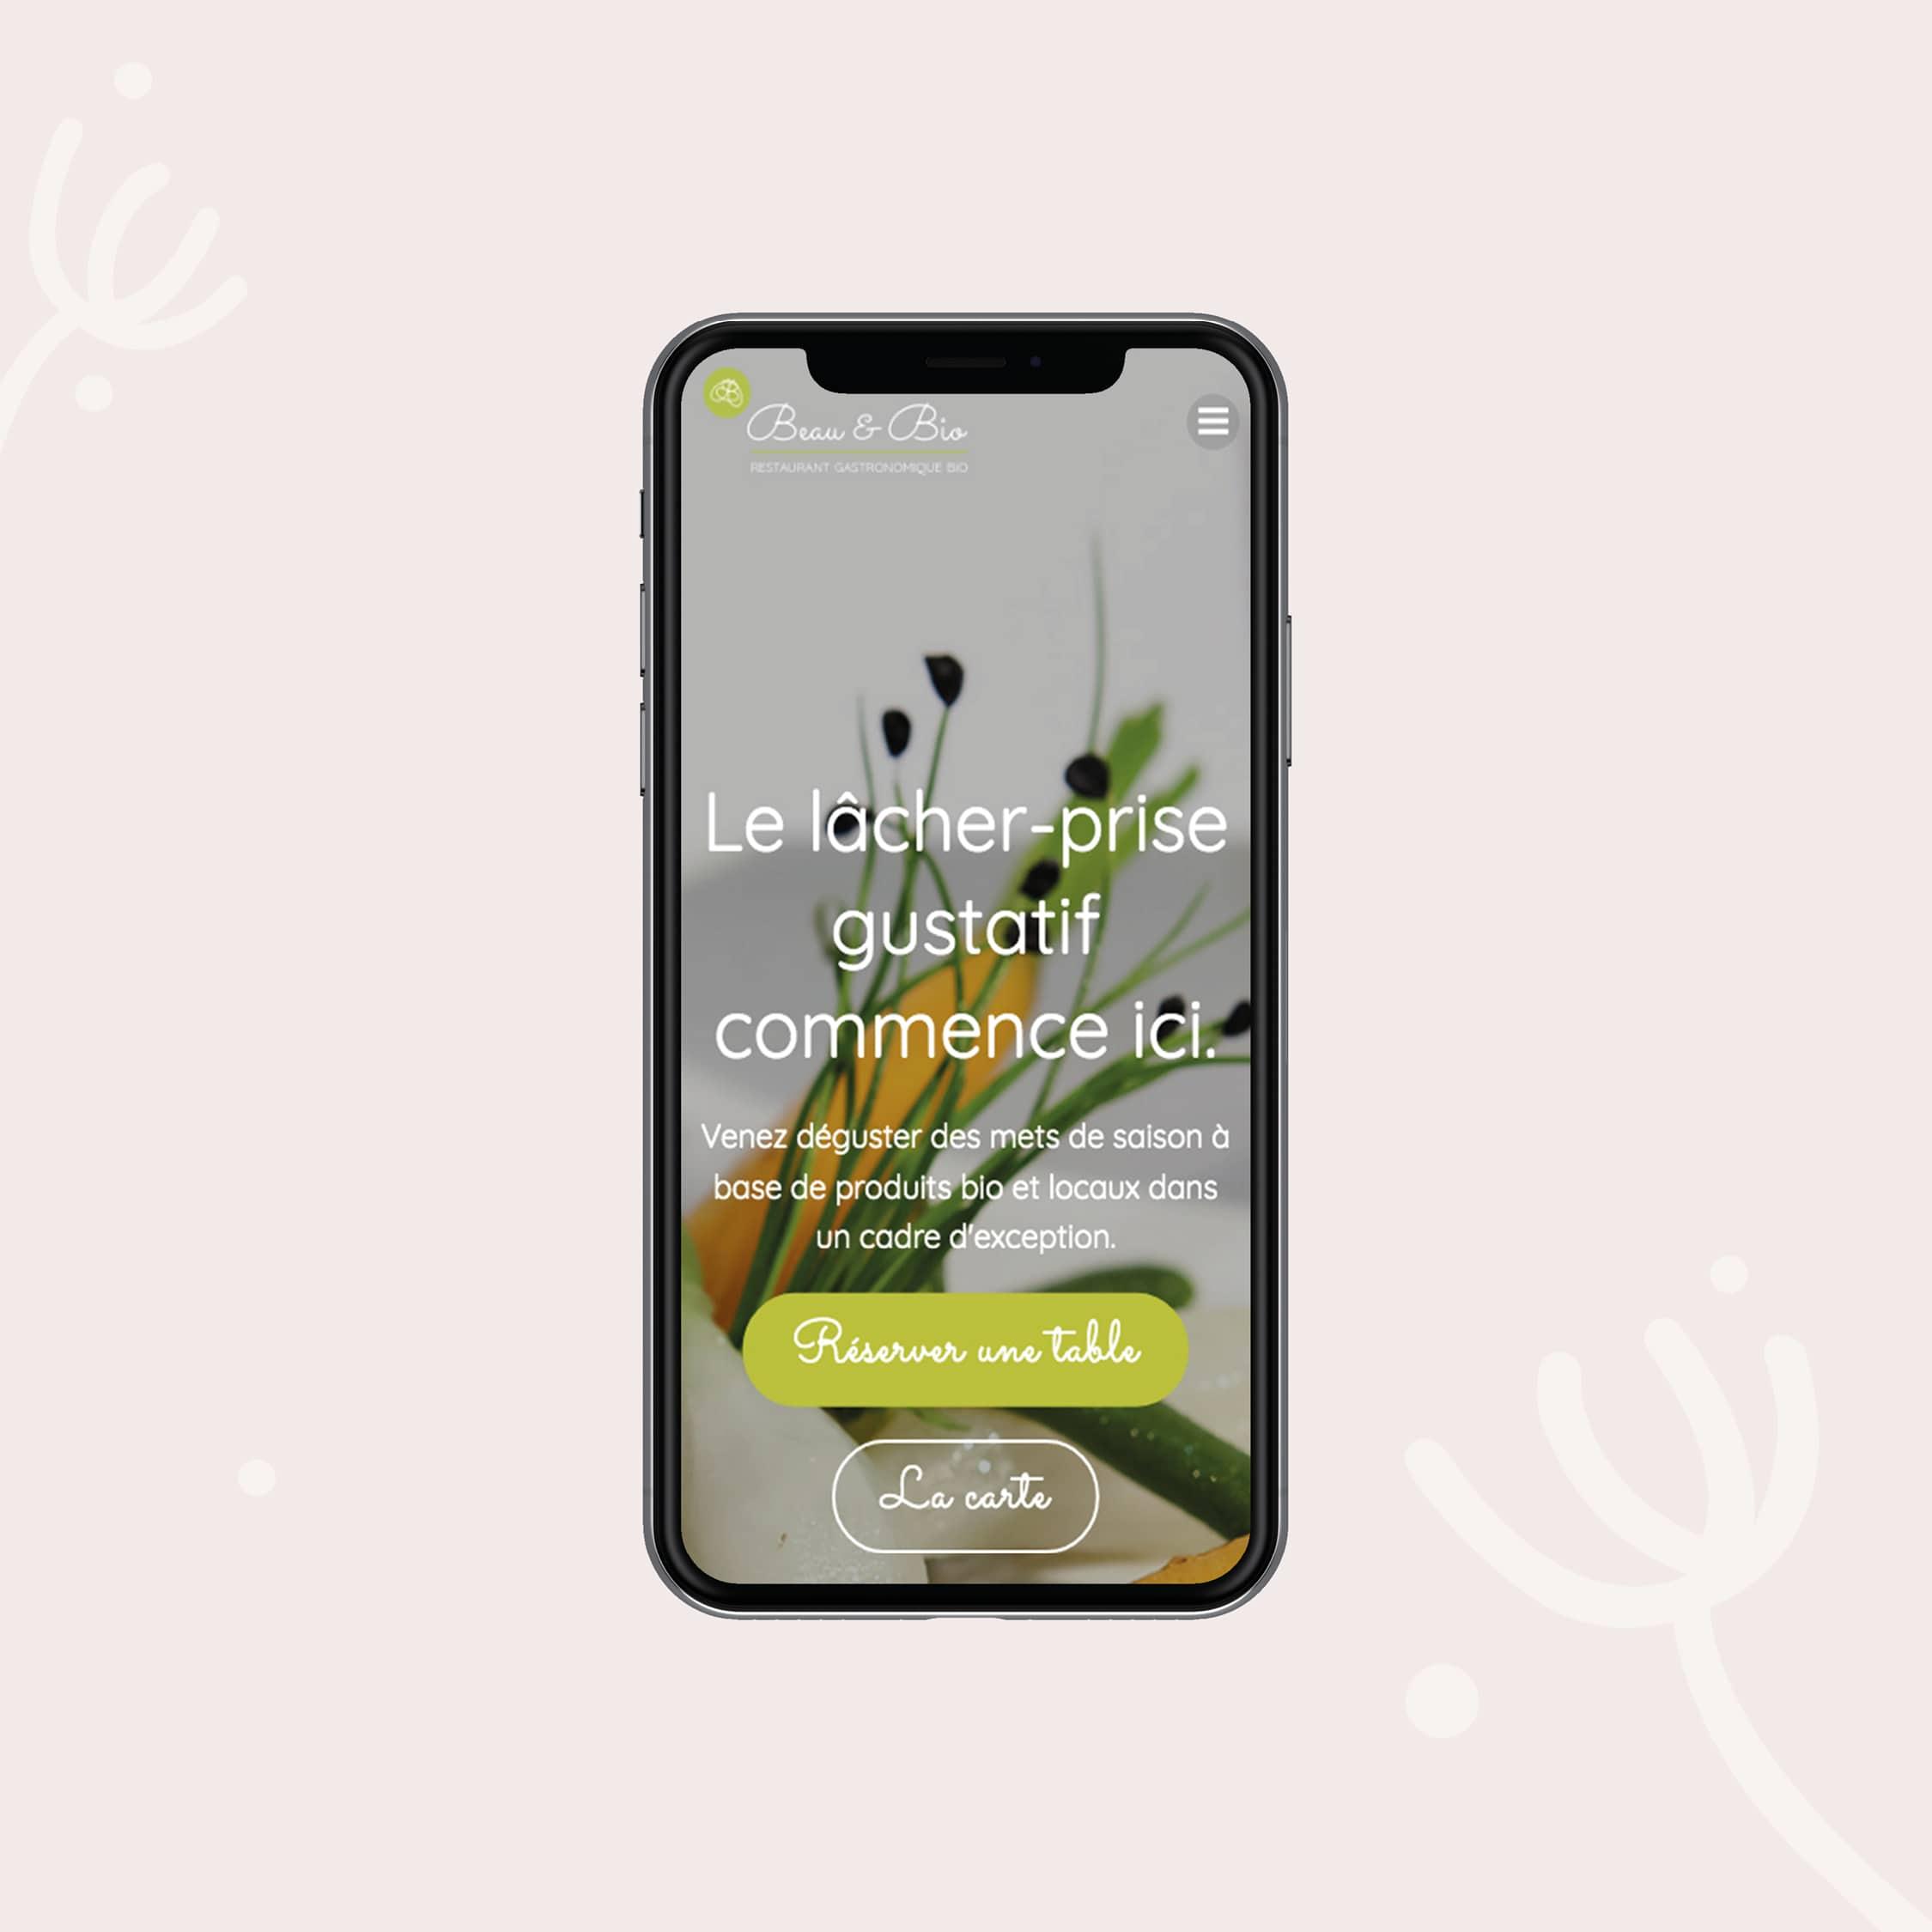 iphone-x-site-beau-et-bio